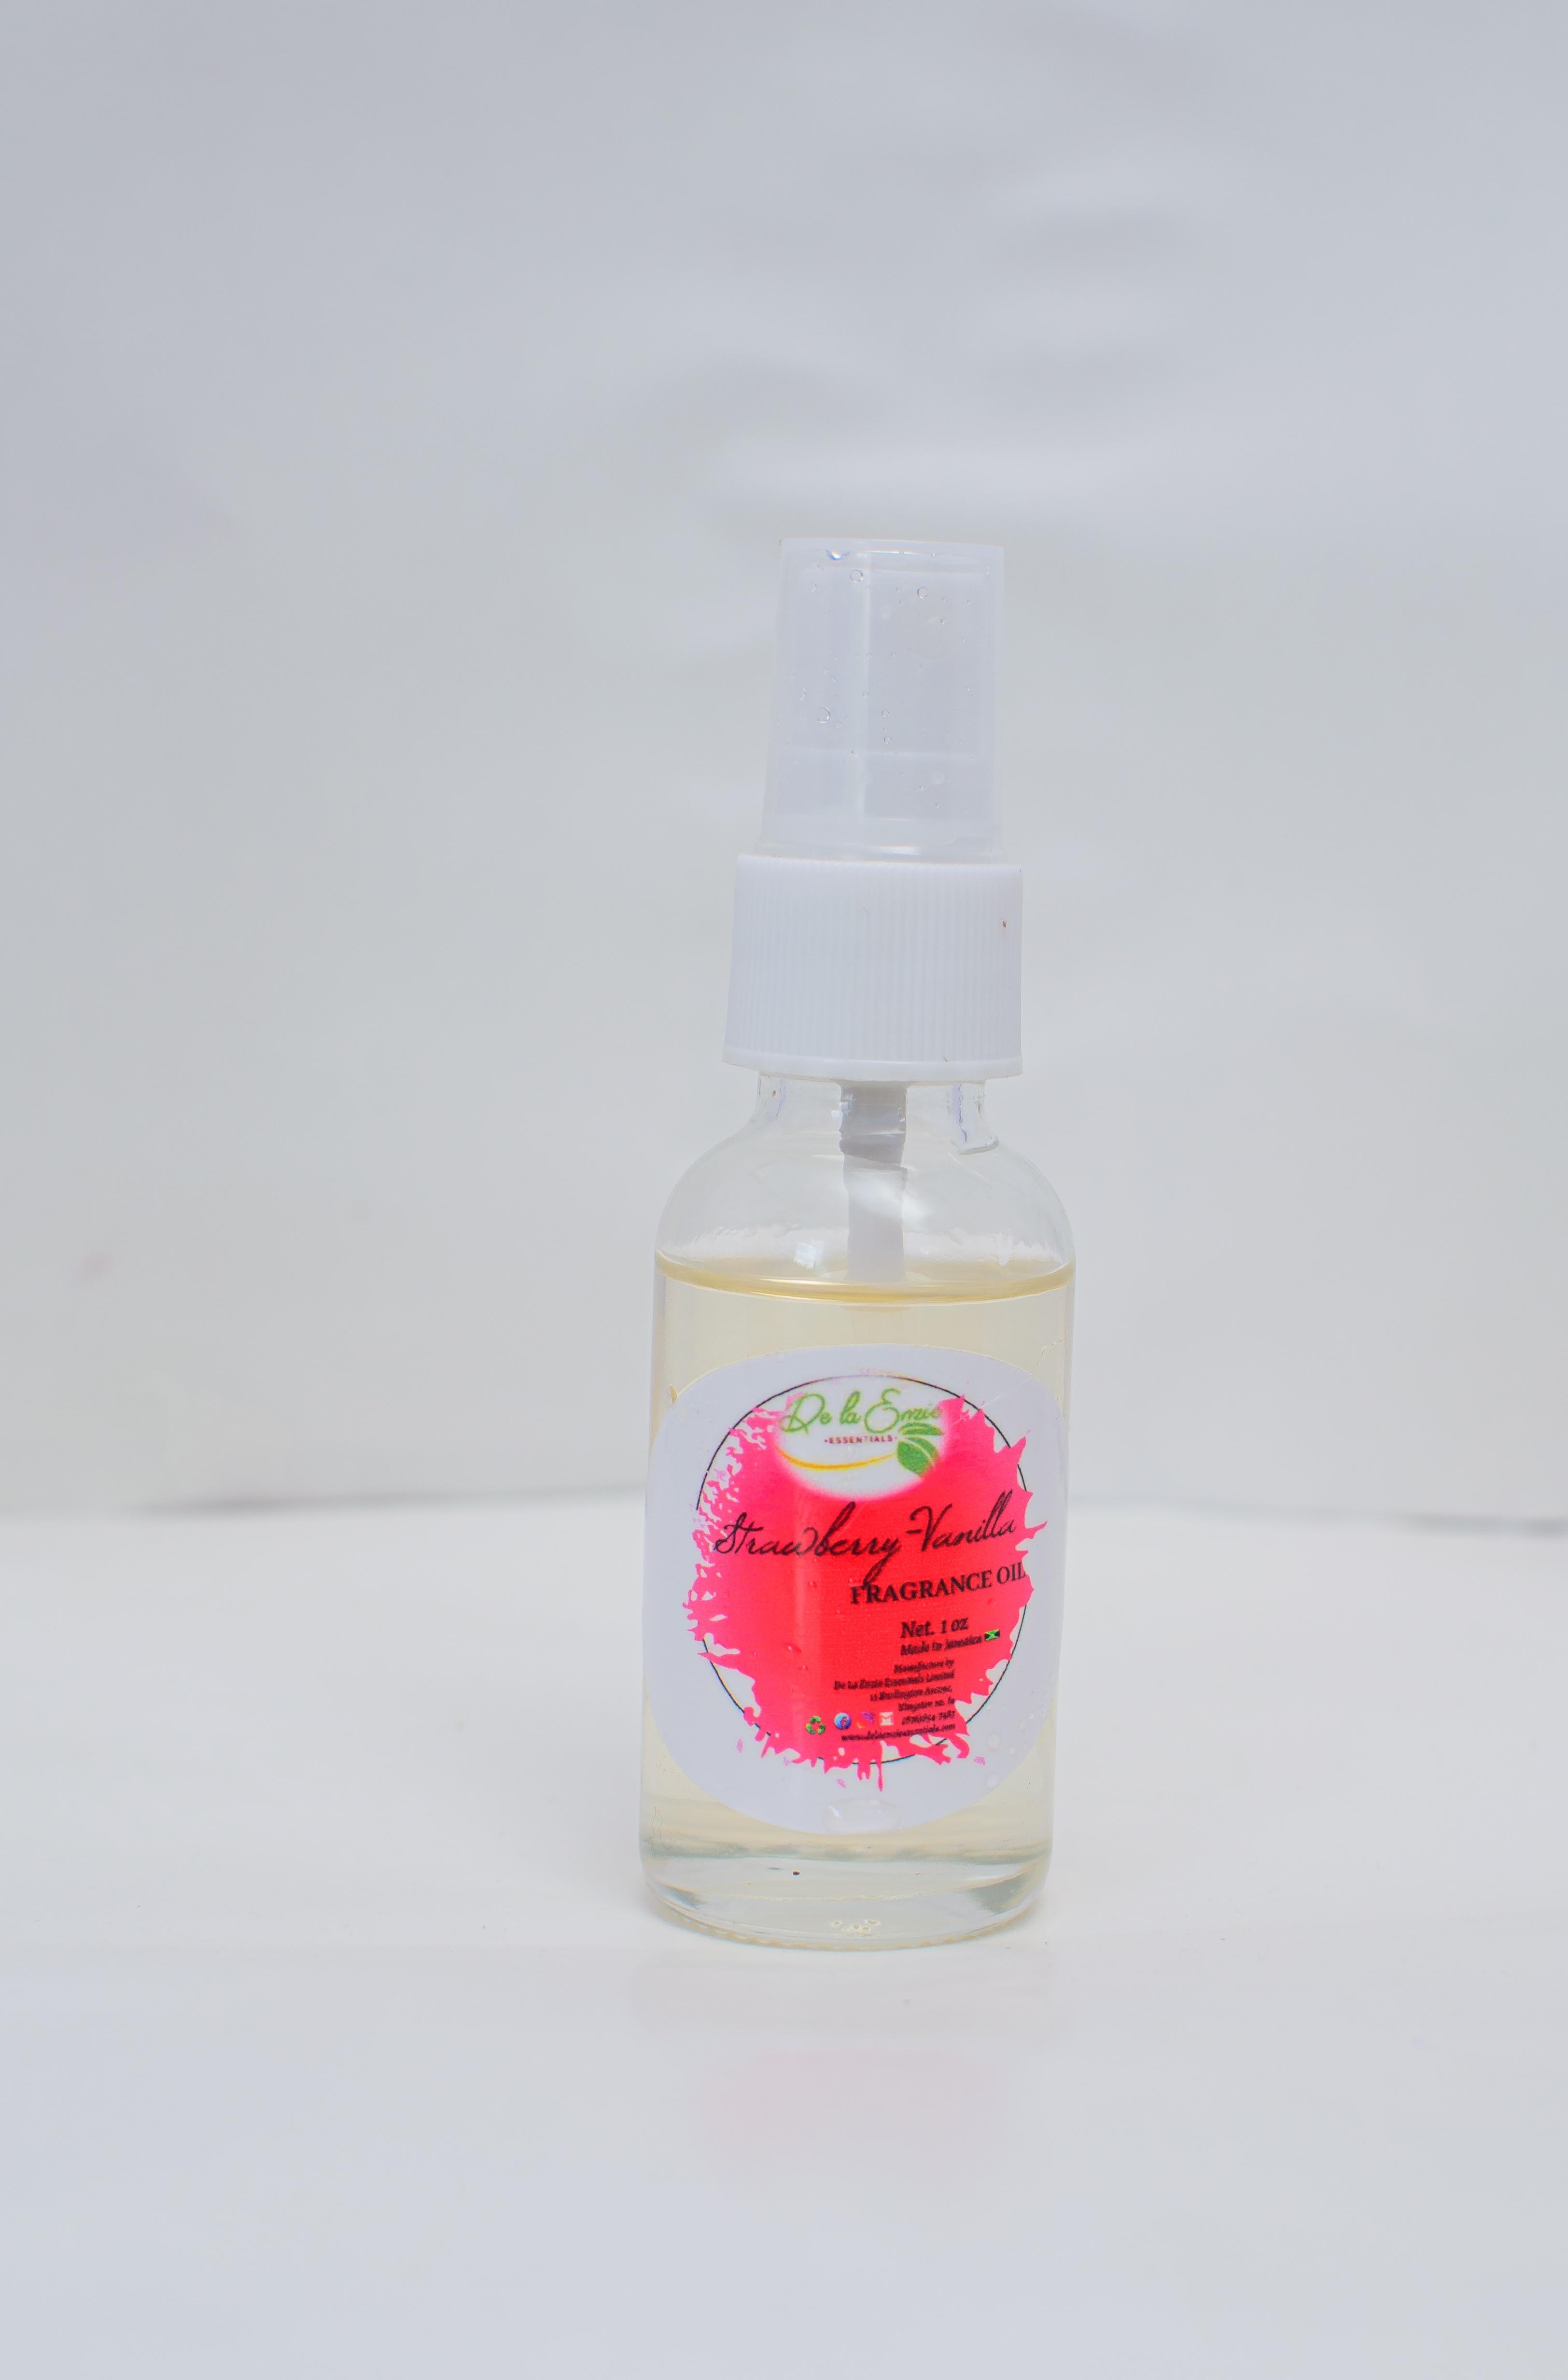 Strawberry Vanilla Fragrance Oil